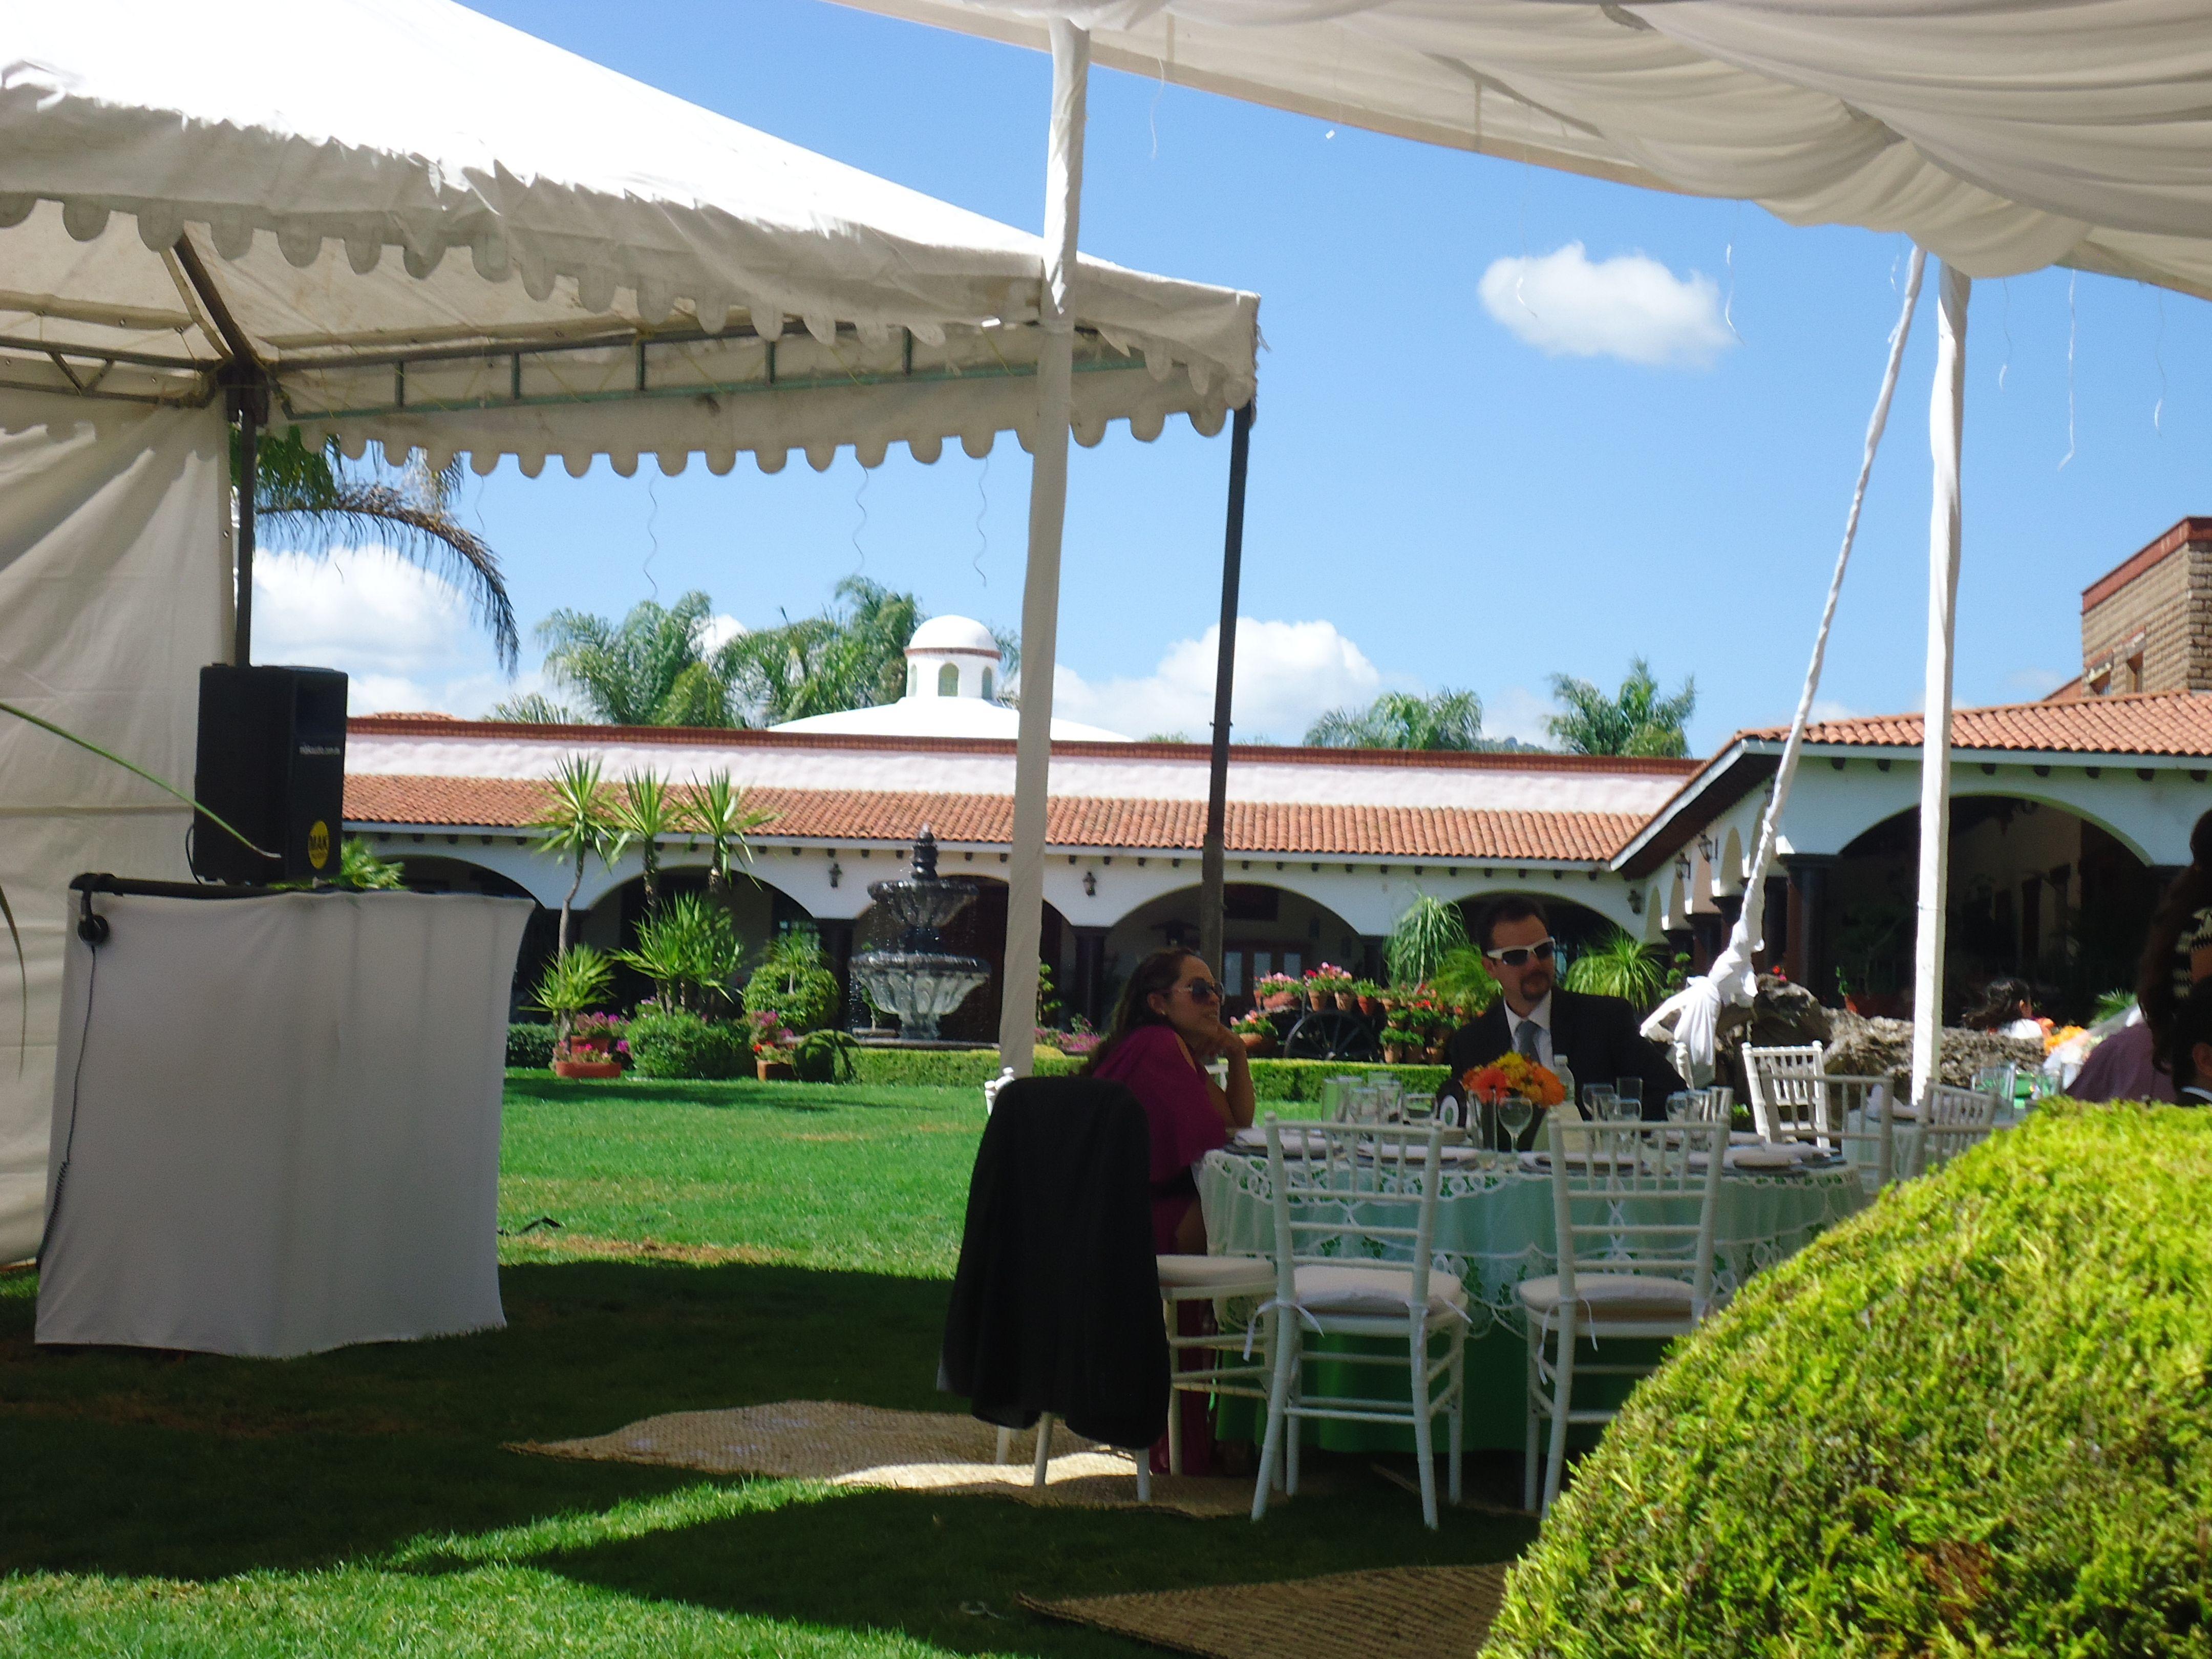 Cabina DJ Audio Digital DJ Professional Para Eventos y Bodas Mak Audio WhatsApp 473 593 8998 Siguenos en twitter @makaudio #bodas #djparaboda #eventos